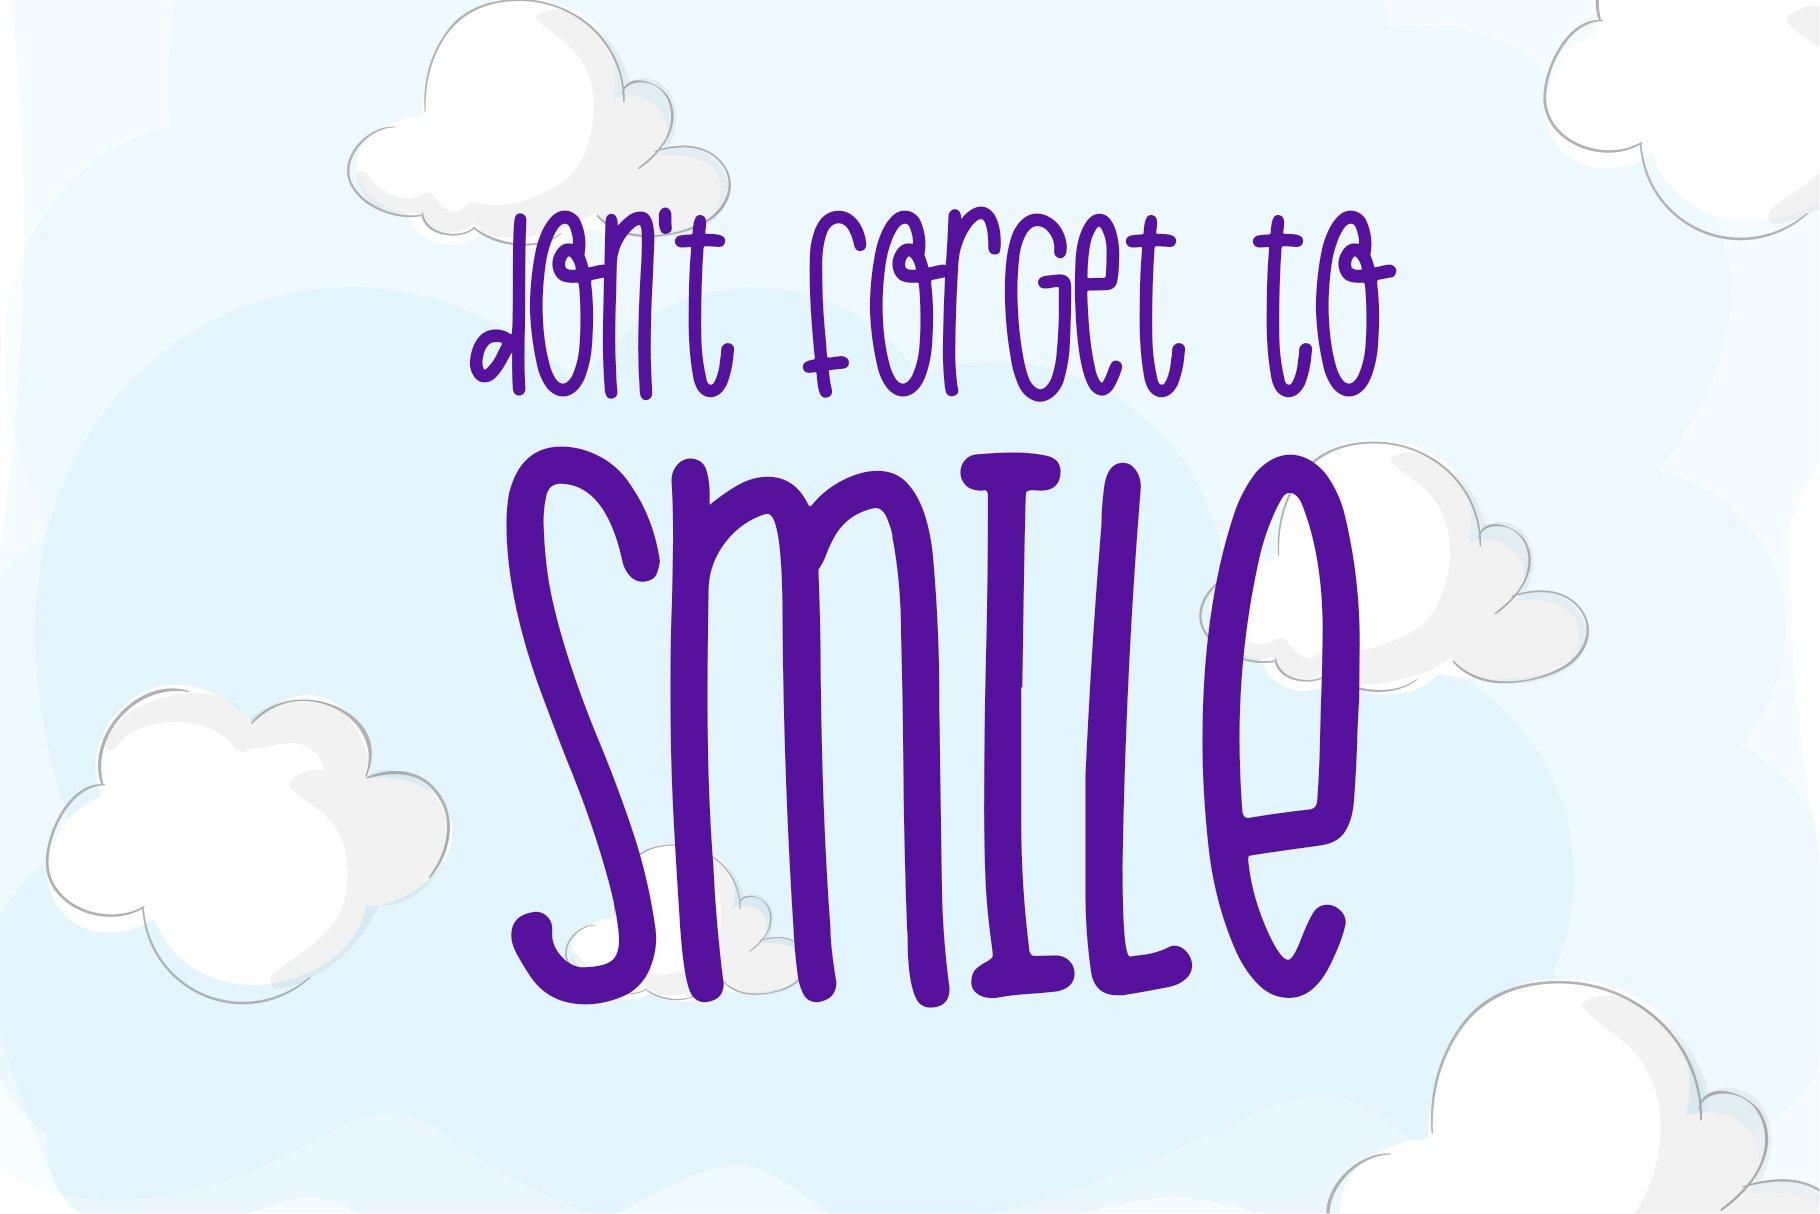 Jolly Dream - Skinny Handwritten Font example image 4